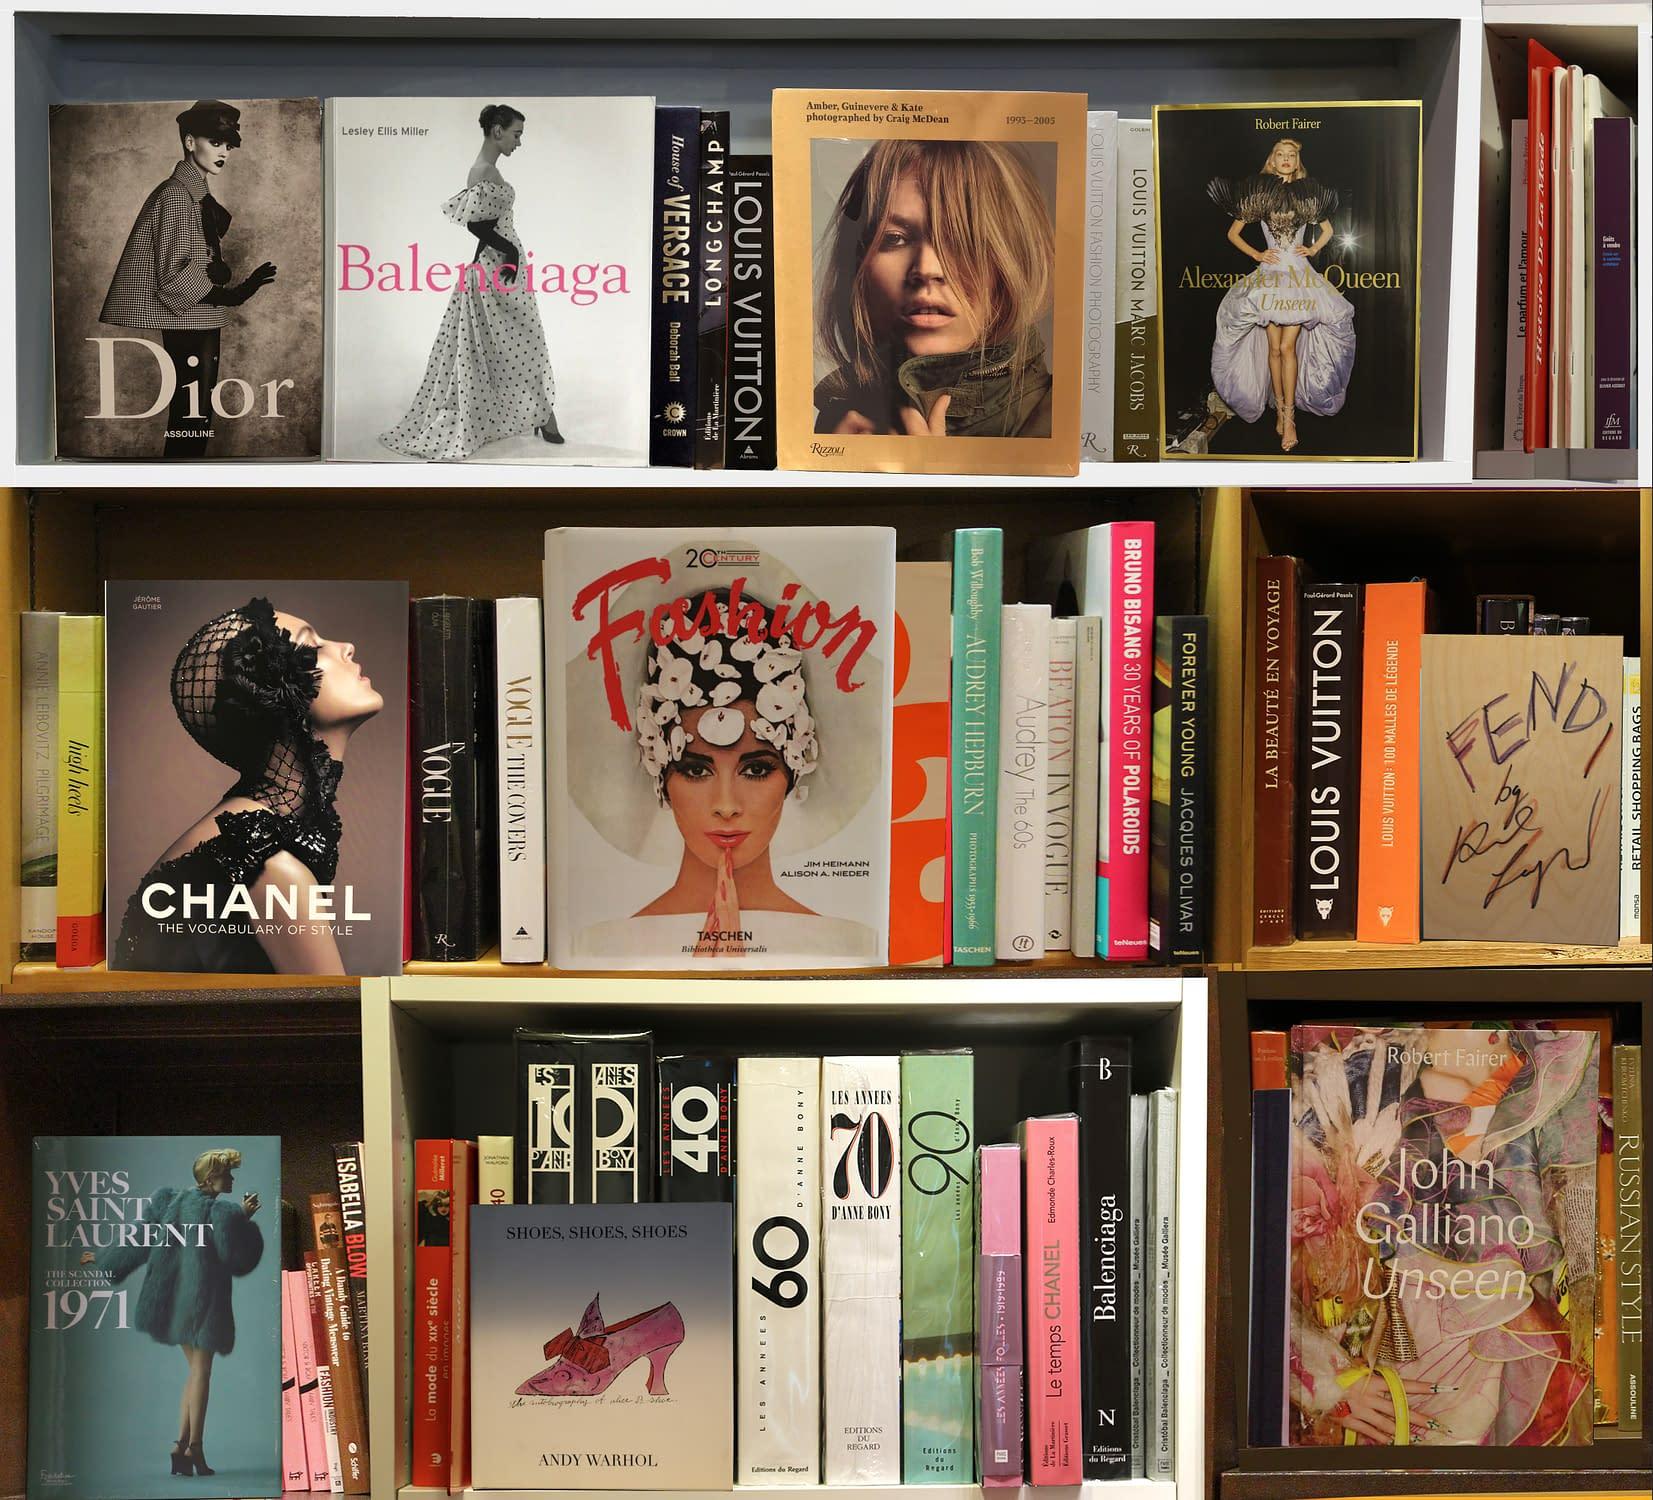 max steven grossman_fashion, bookscape, photography, interiors, joanne artman gallery